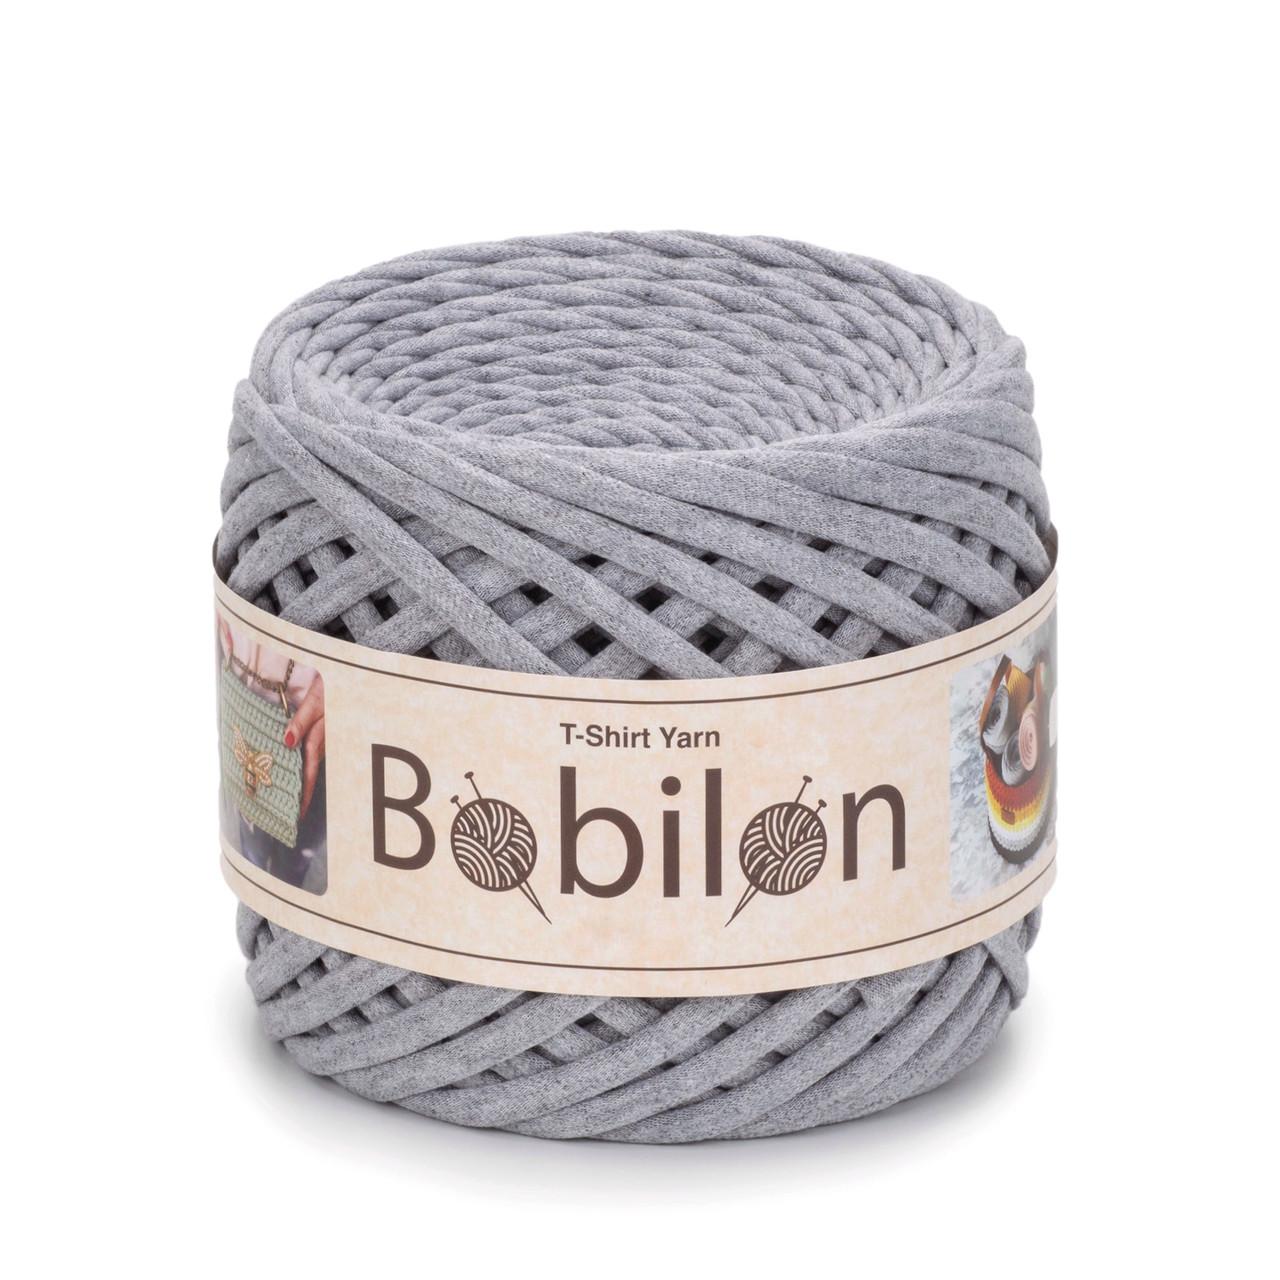 Толстая пряжа Bobilon Medium (7-9 мм). Gray Melange  Серый меланж